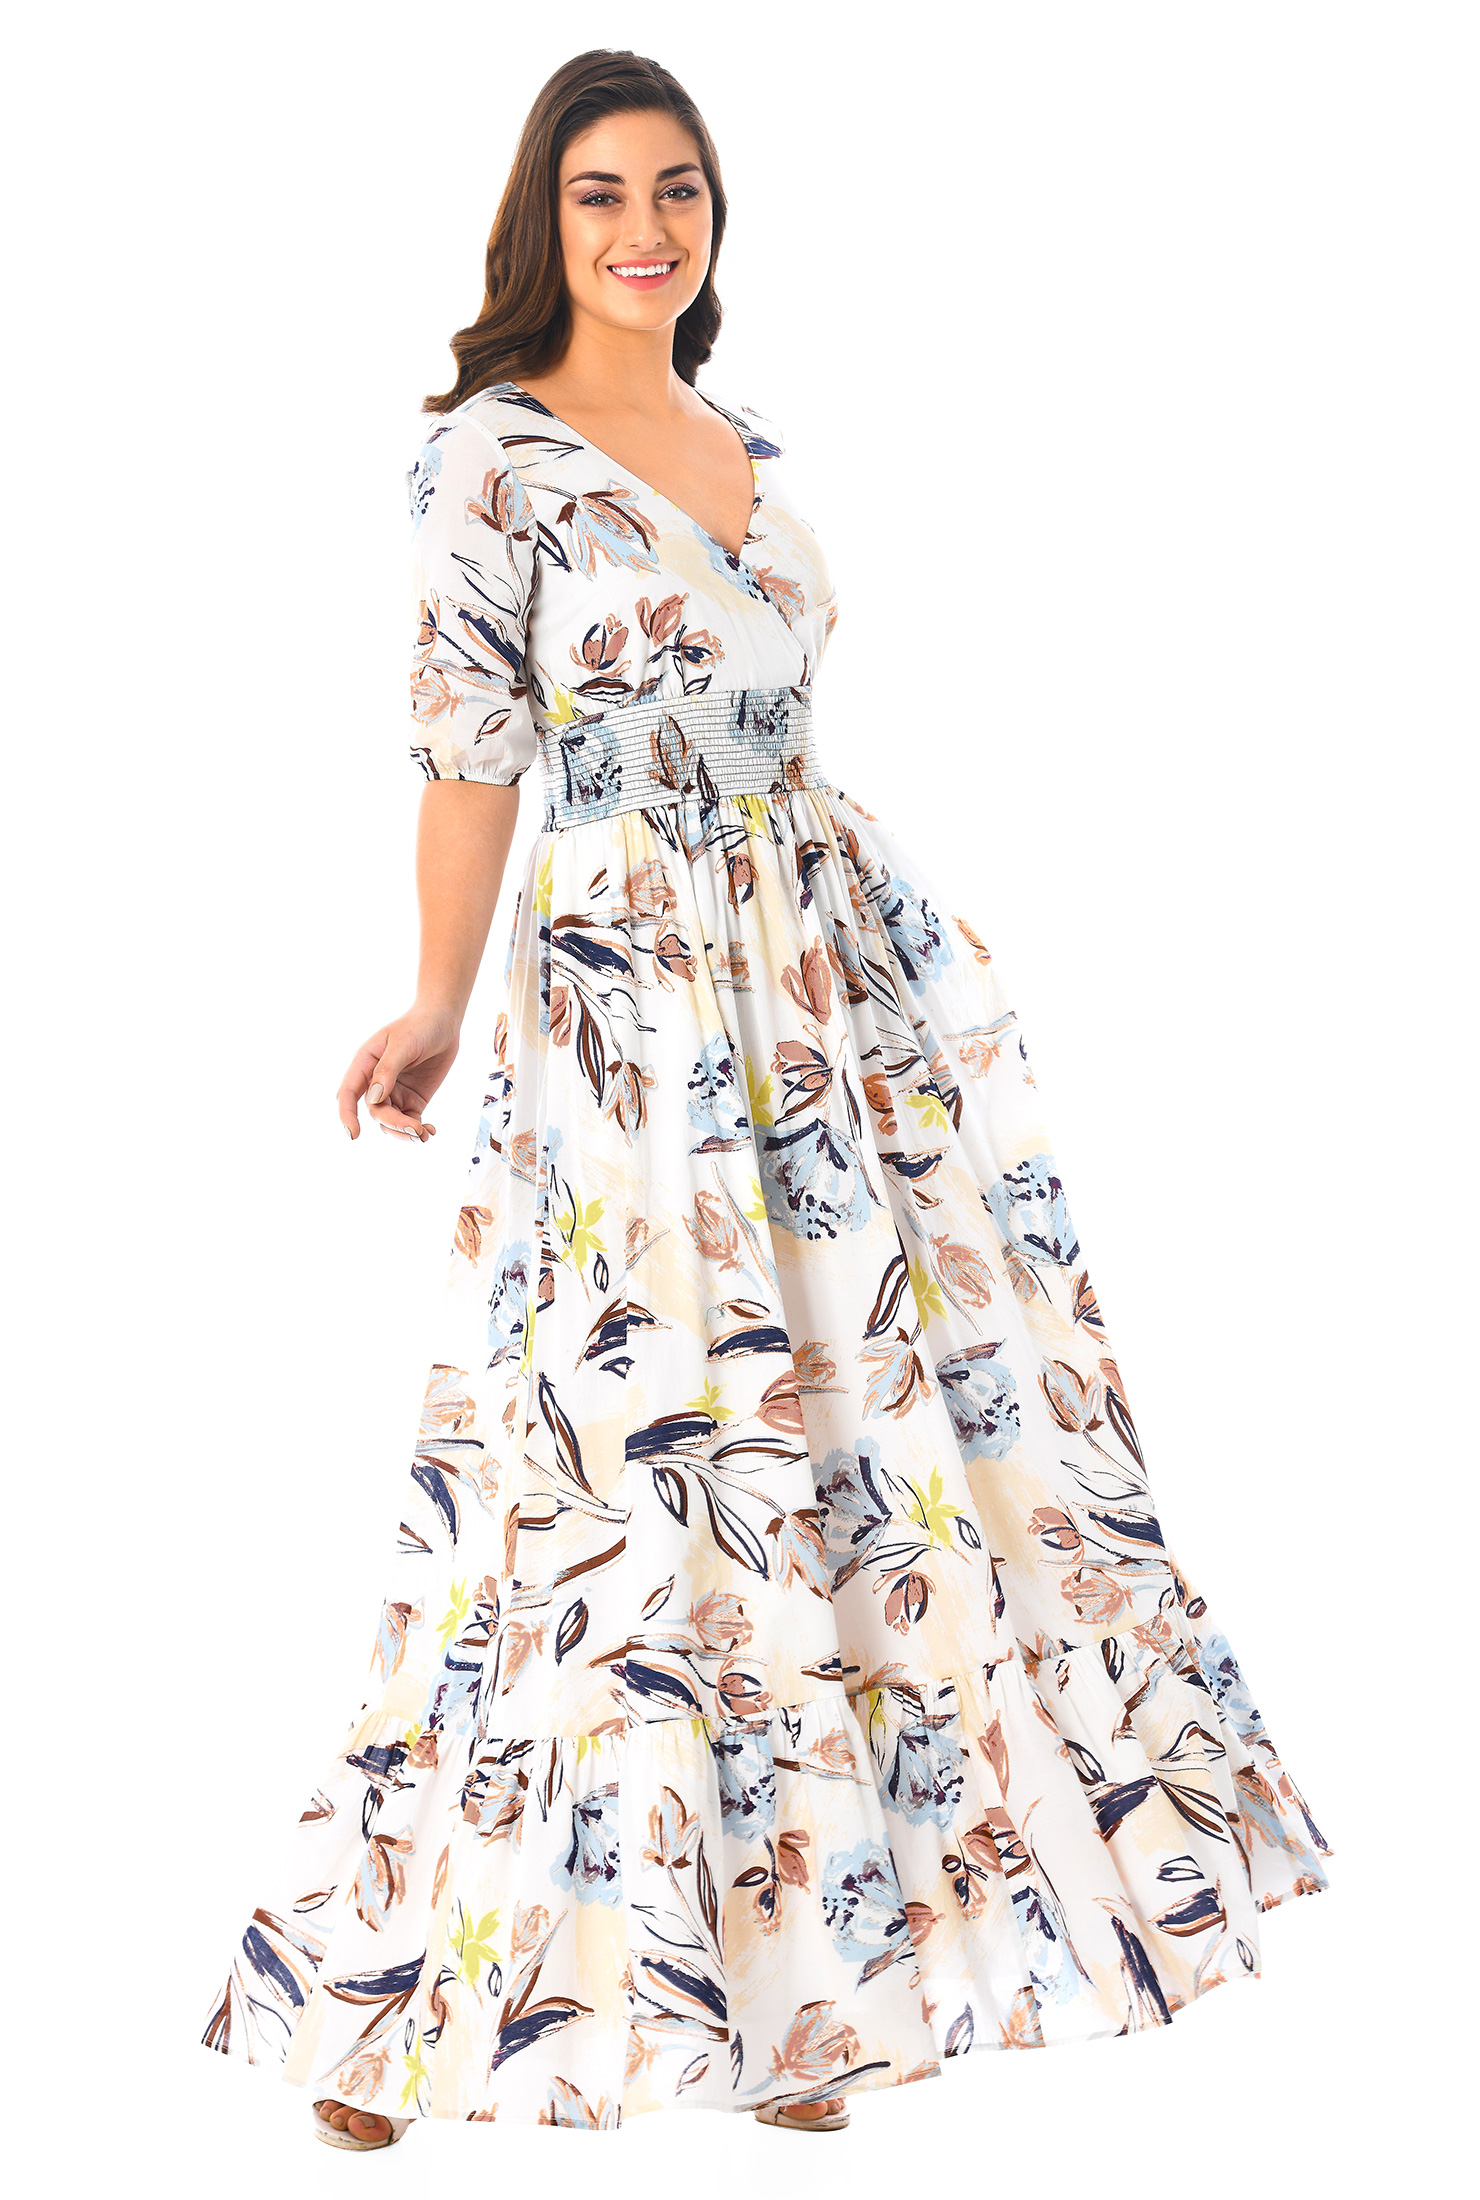 56f8e4a35 Women s Fashion Clothing 0-36W and Custom